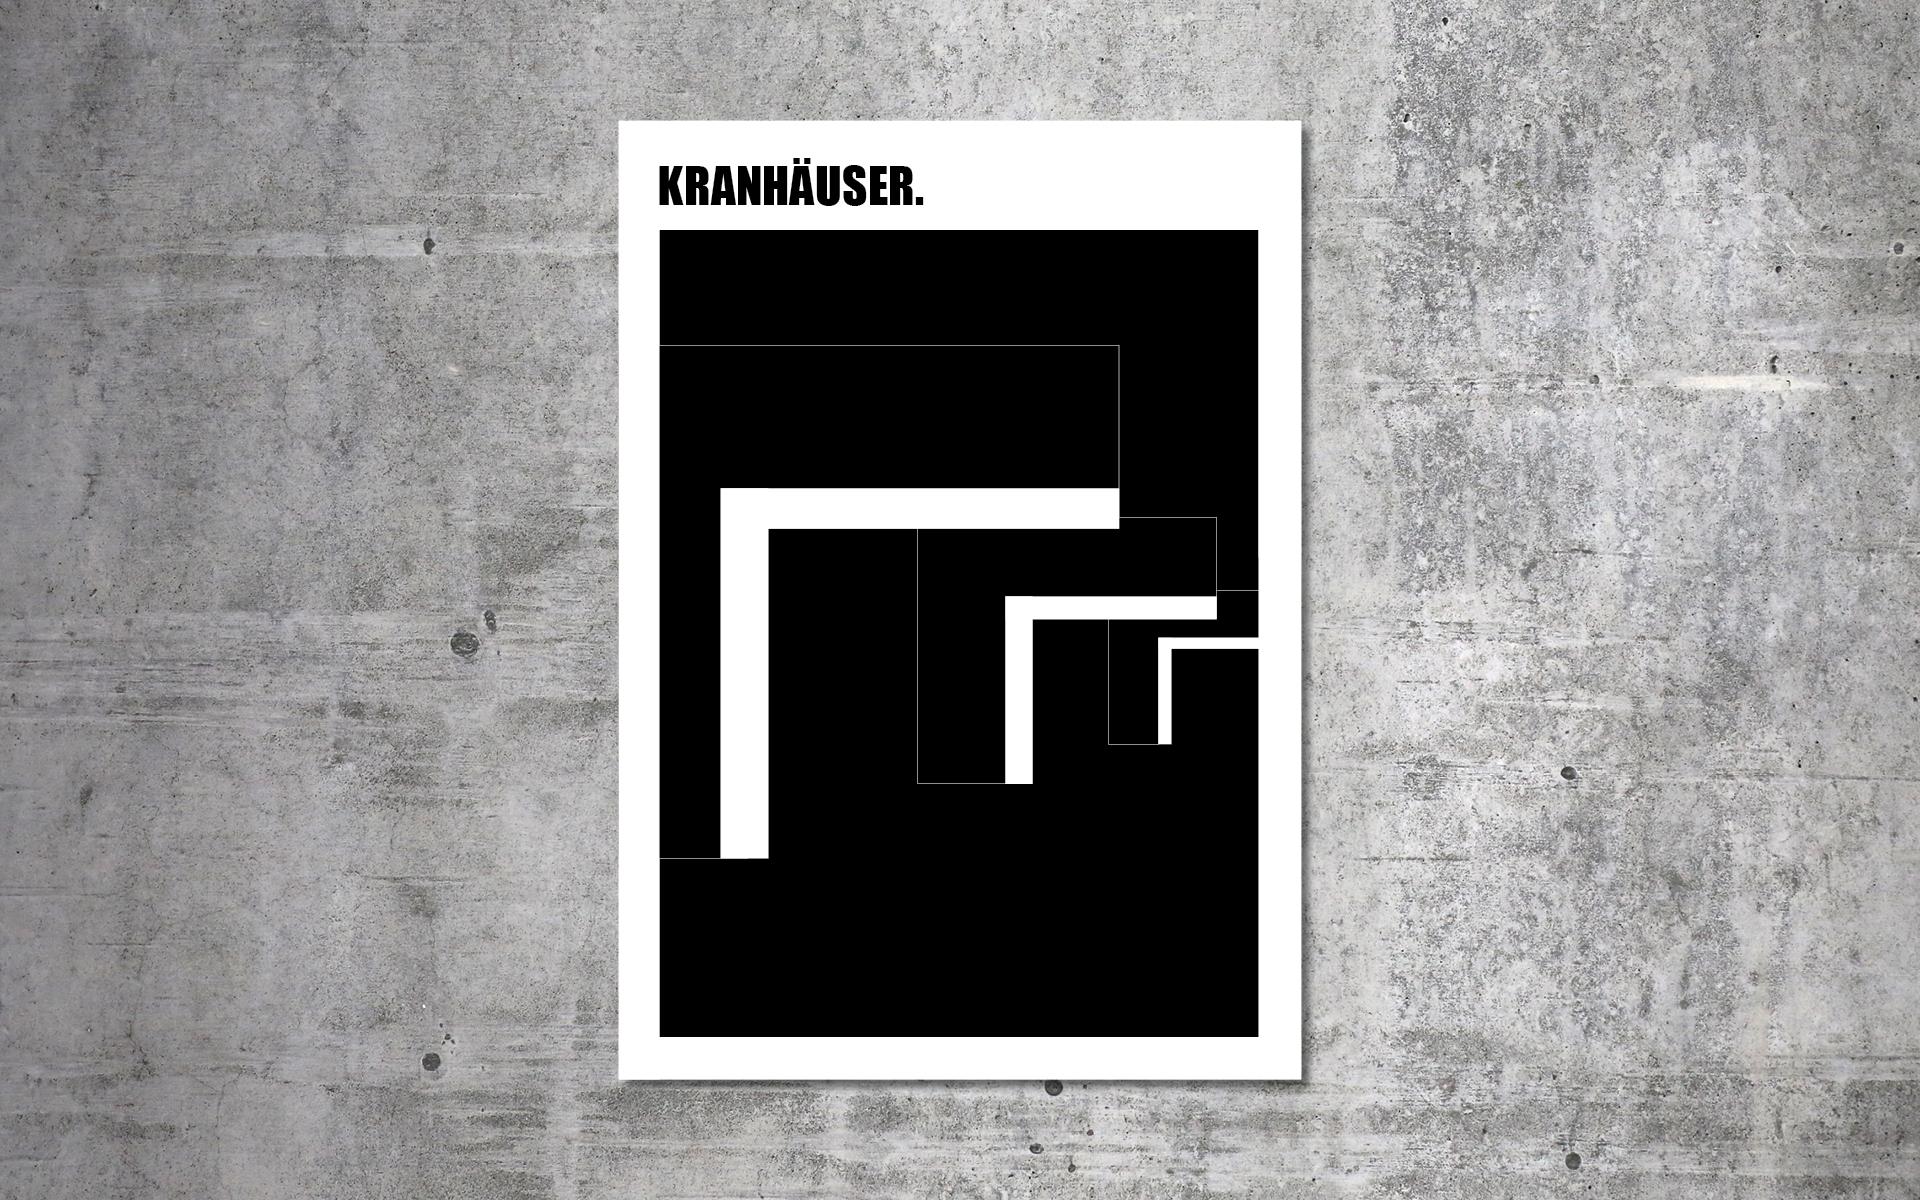 Julian Danner – Serie Köln, Kranhäuser